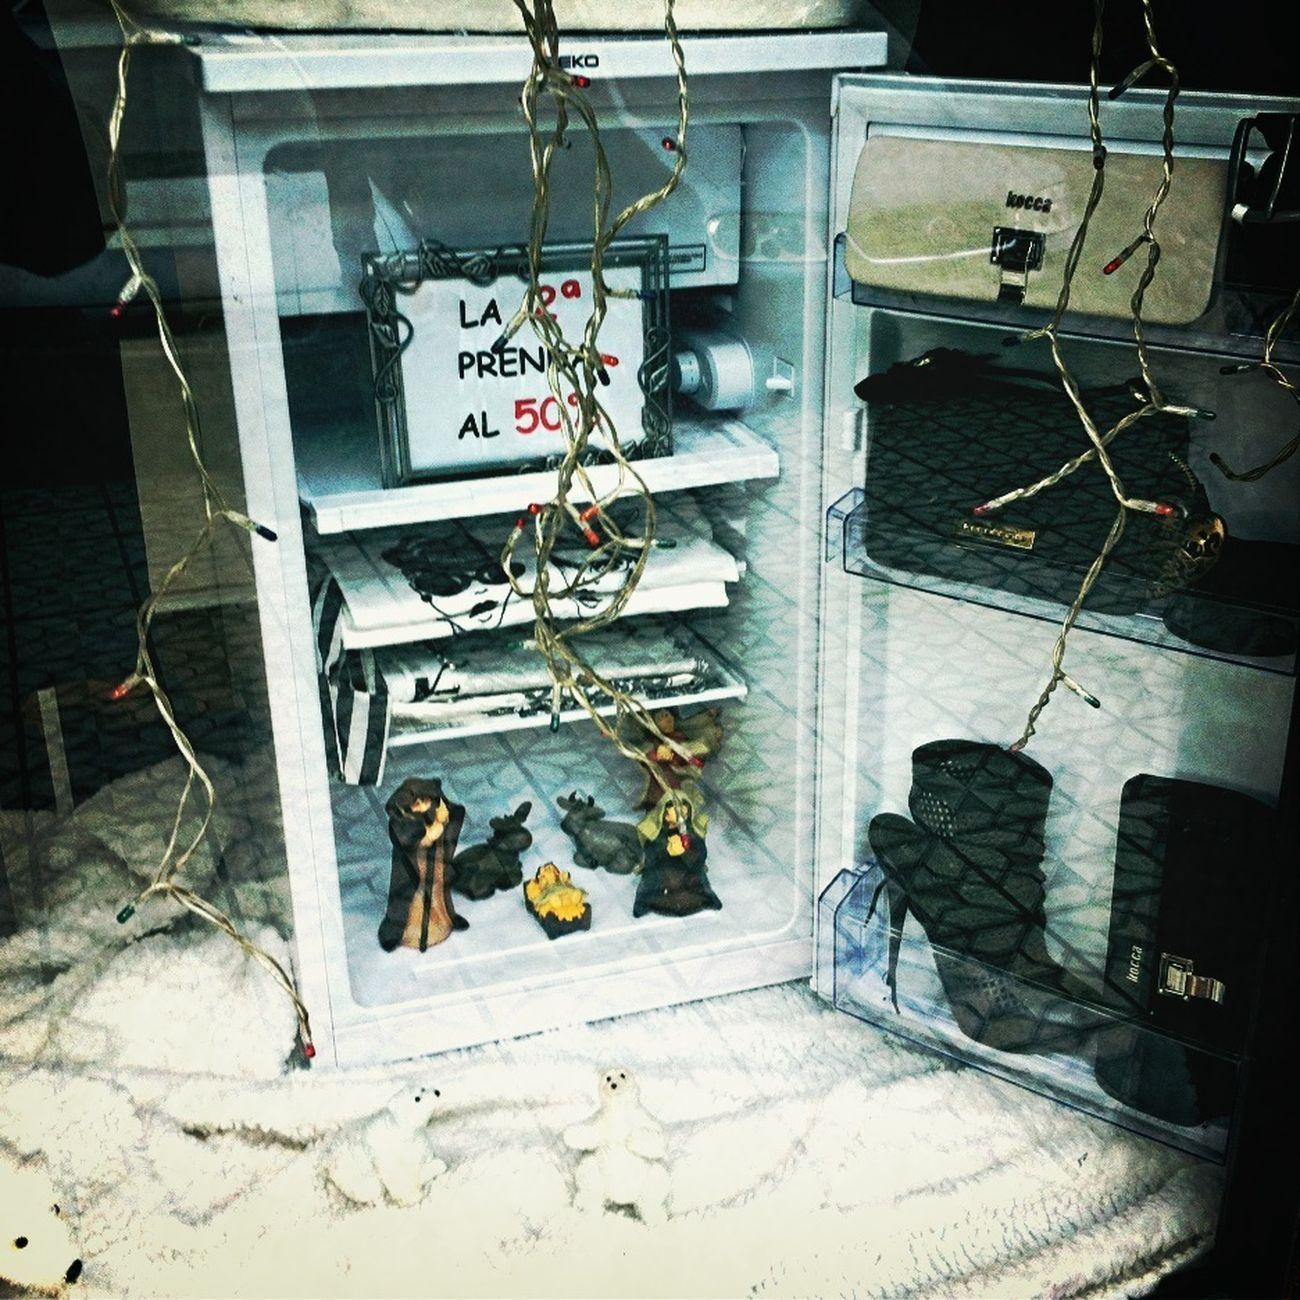 Nativity in the fridge. With polar bears.